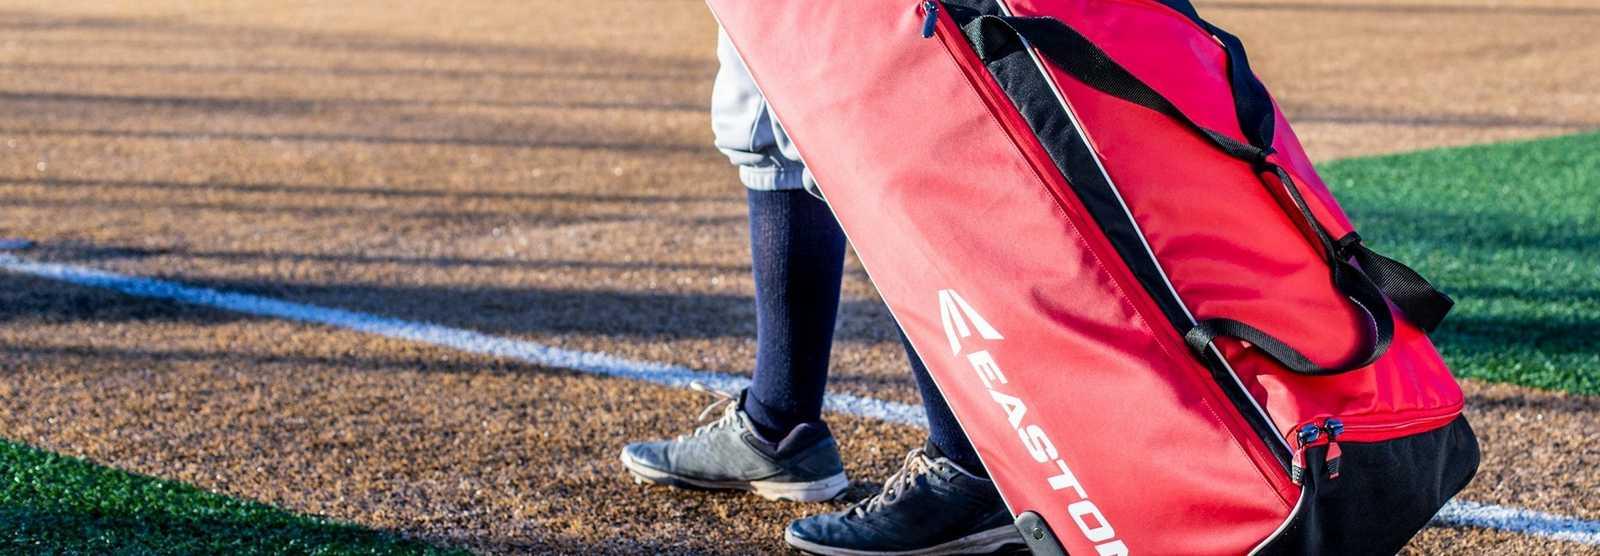 slow-pitch-softball-wheeled-bags